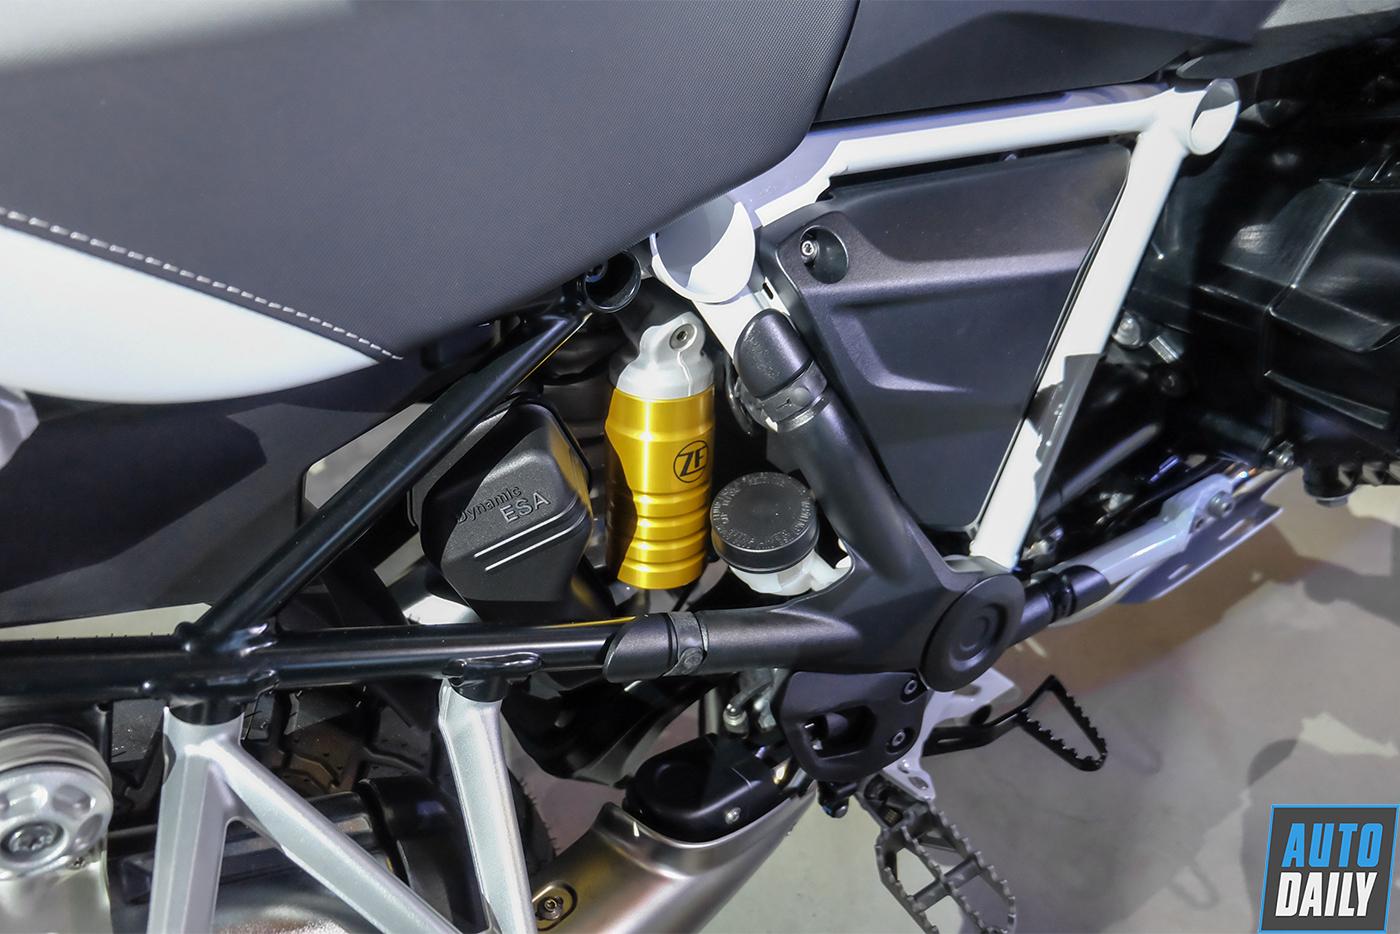 bmw-motorrad-r-1250-gs-2019-20.jpg